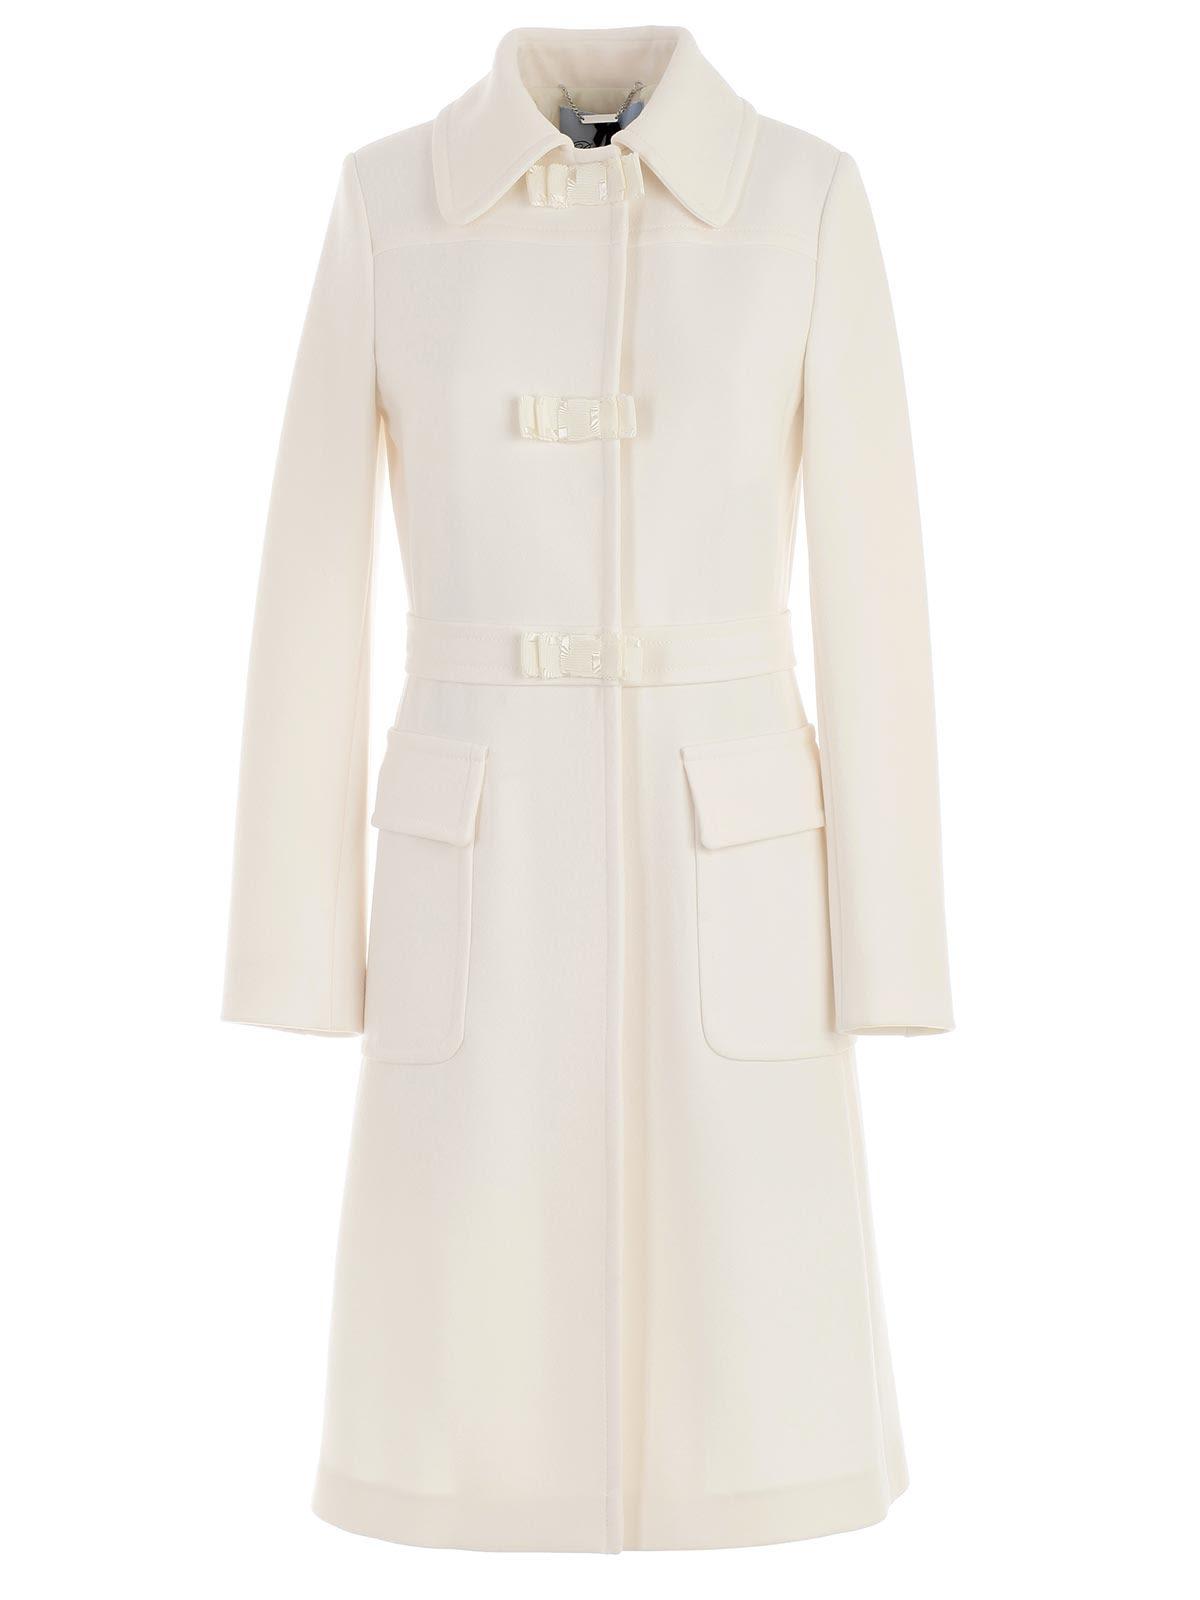 Blumarine Bow Detail Coat